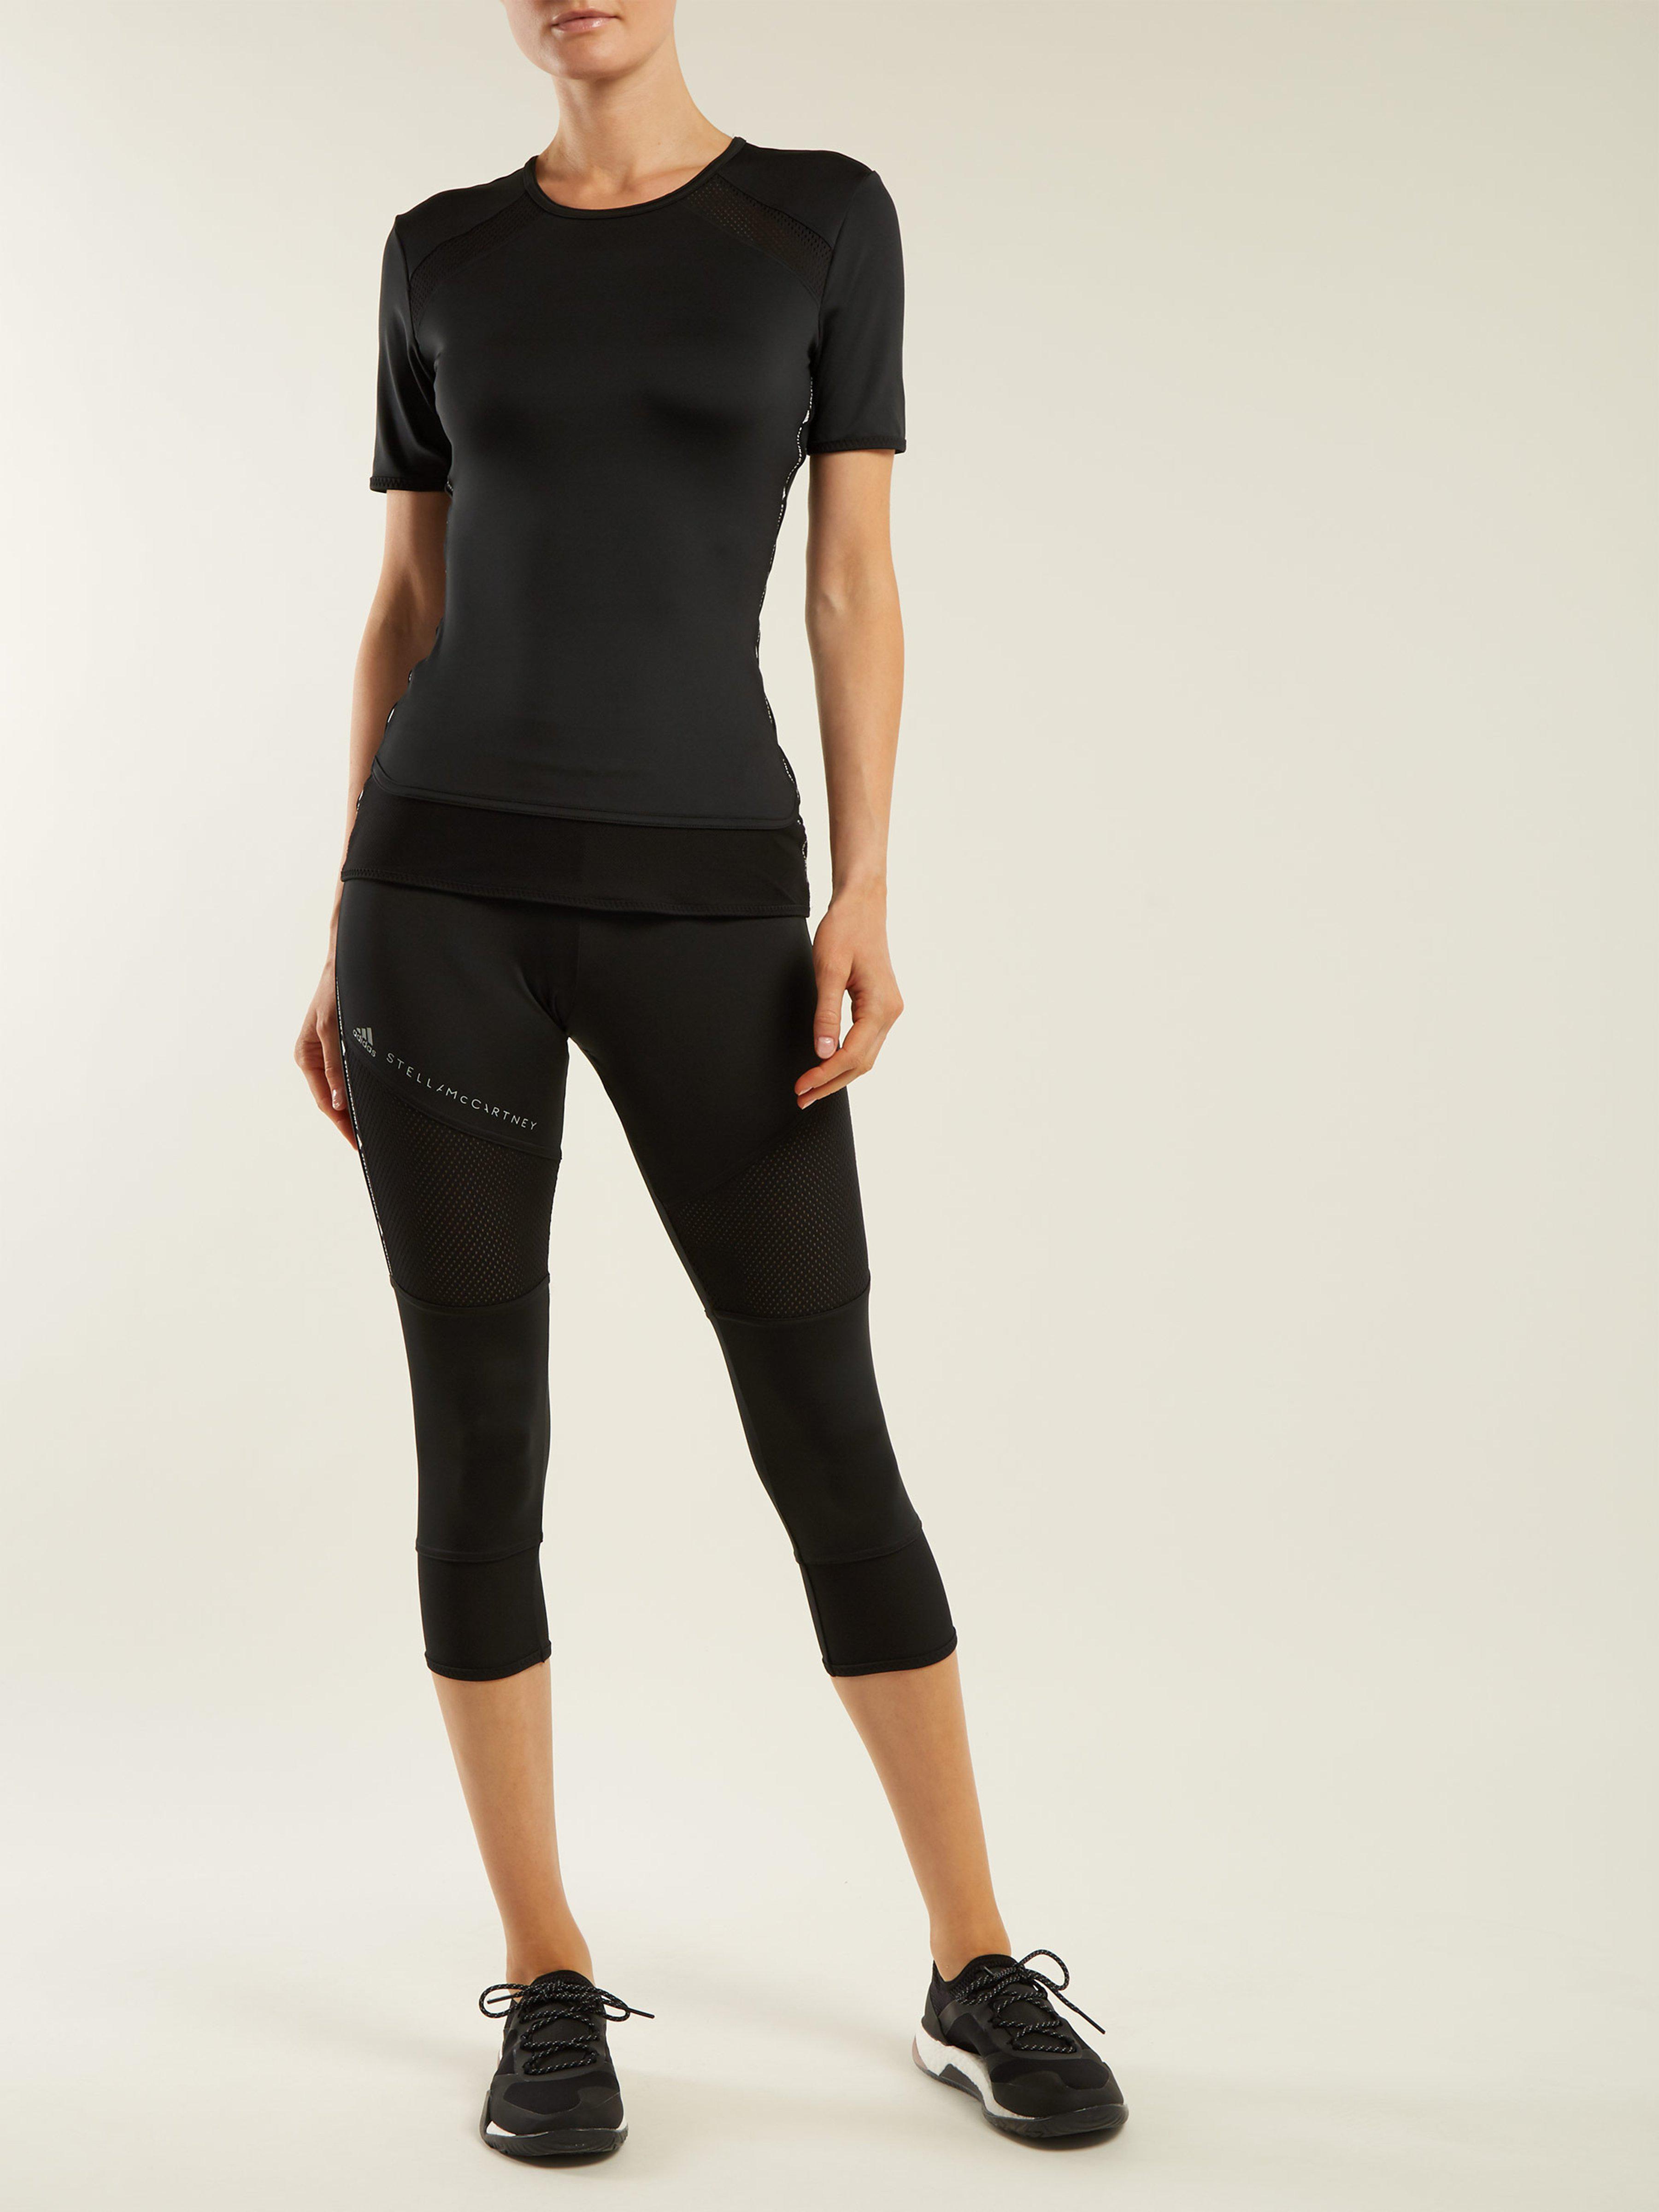 adidas By Stella McCartney Essential Cropped Performance Leggings in Black